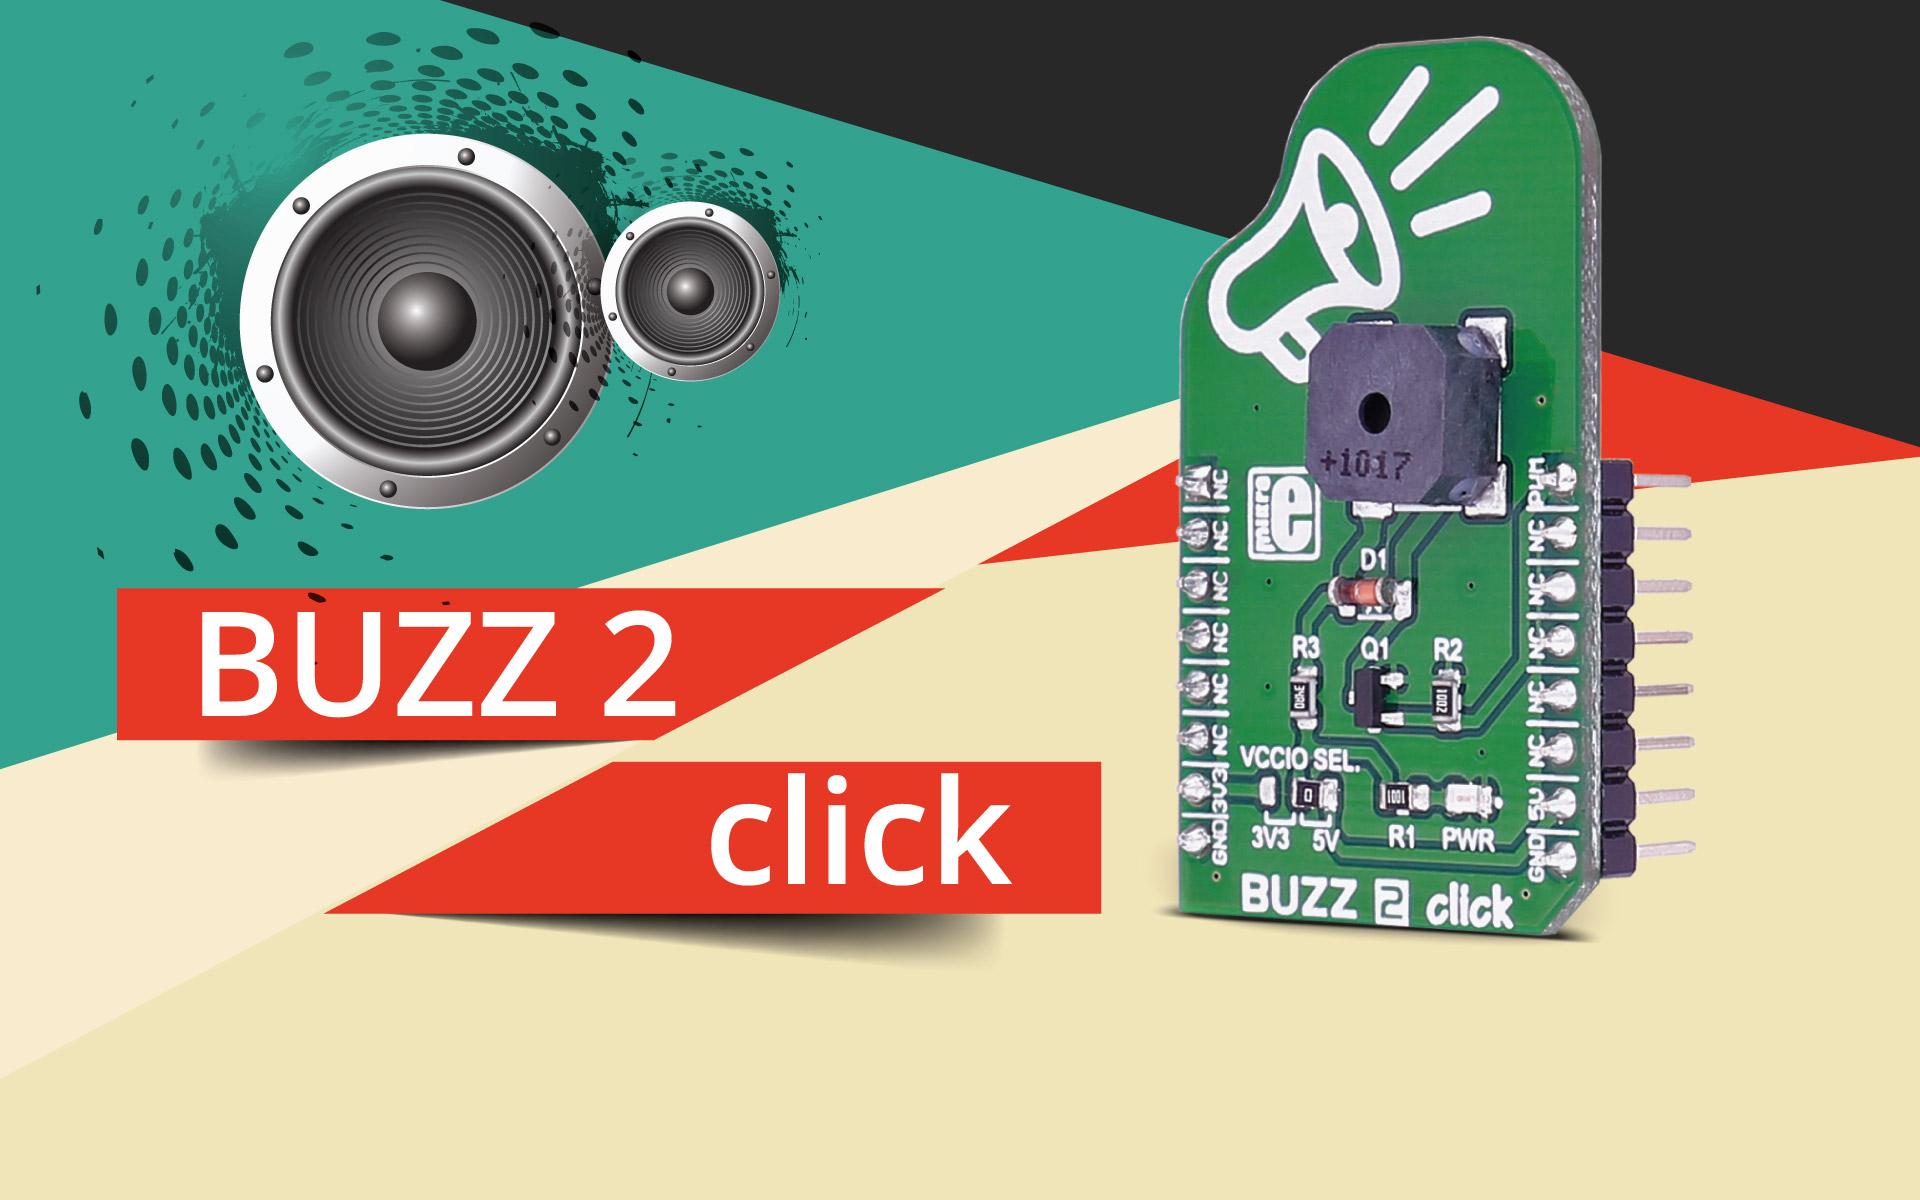 BUZZ 2 click - magnetic buzzer transducer